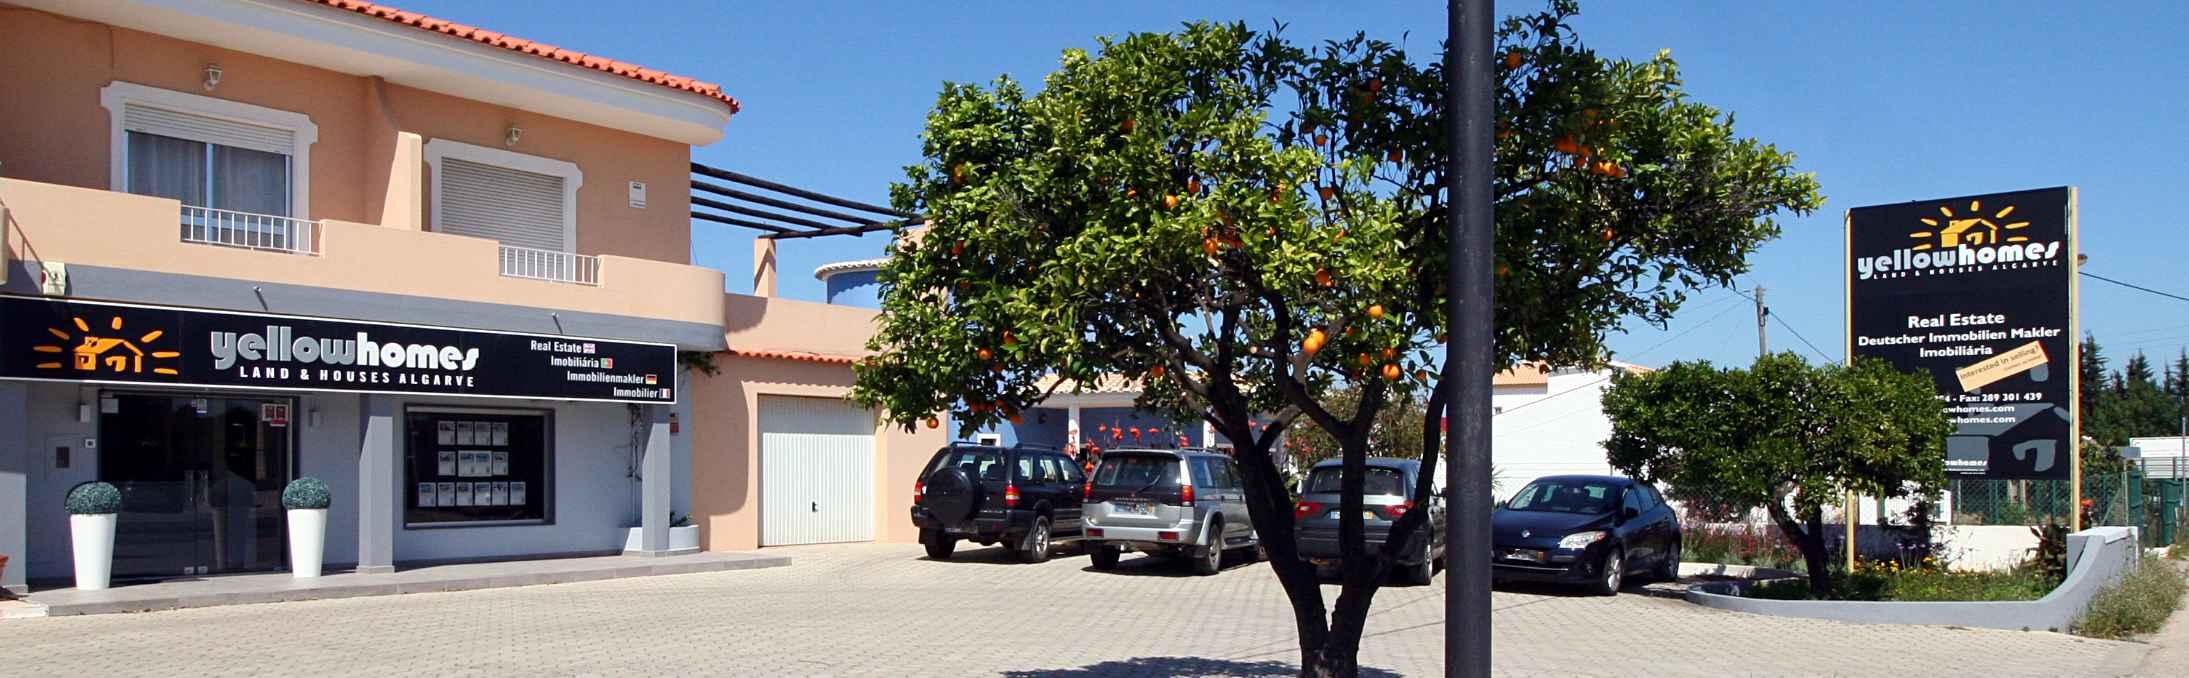 Yellow Homes Real estate agent Algarve.jpg